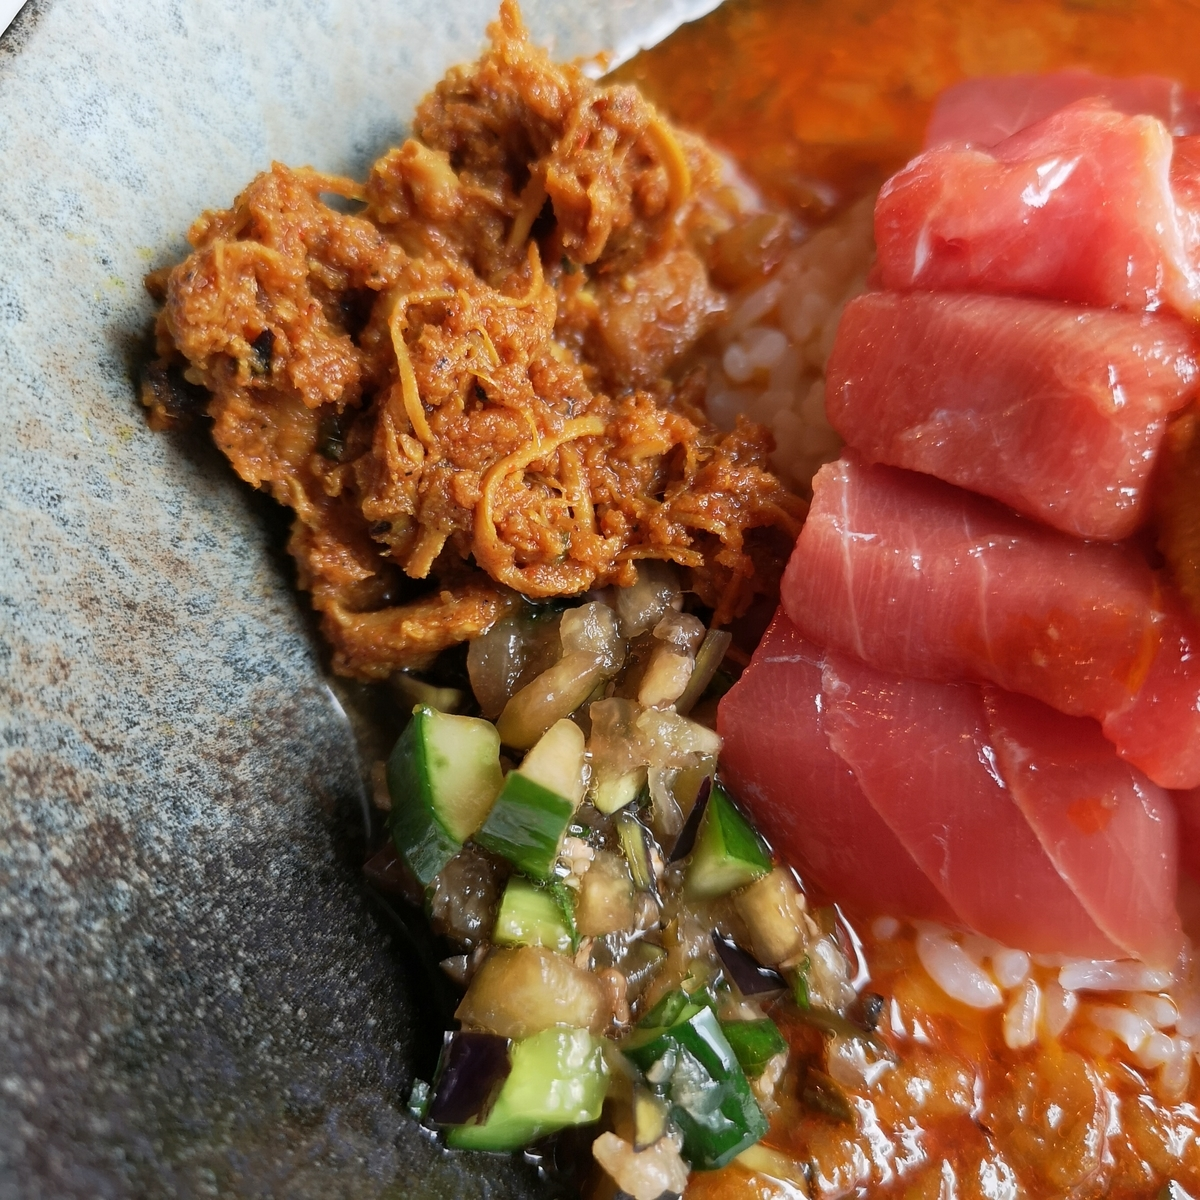 wacca 2019年8月31日 冷製ニボ醤油な贅沢海鮮スープカレー